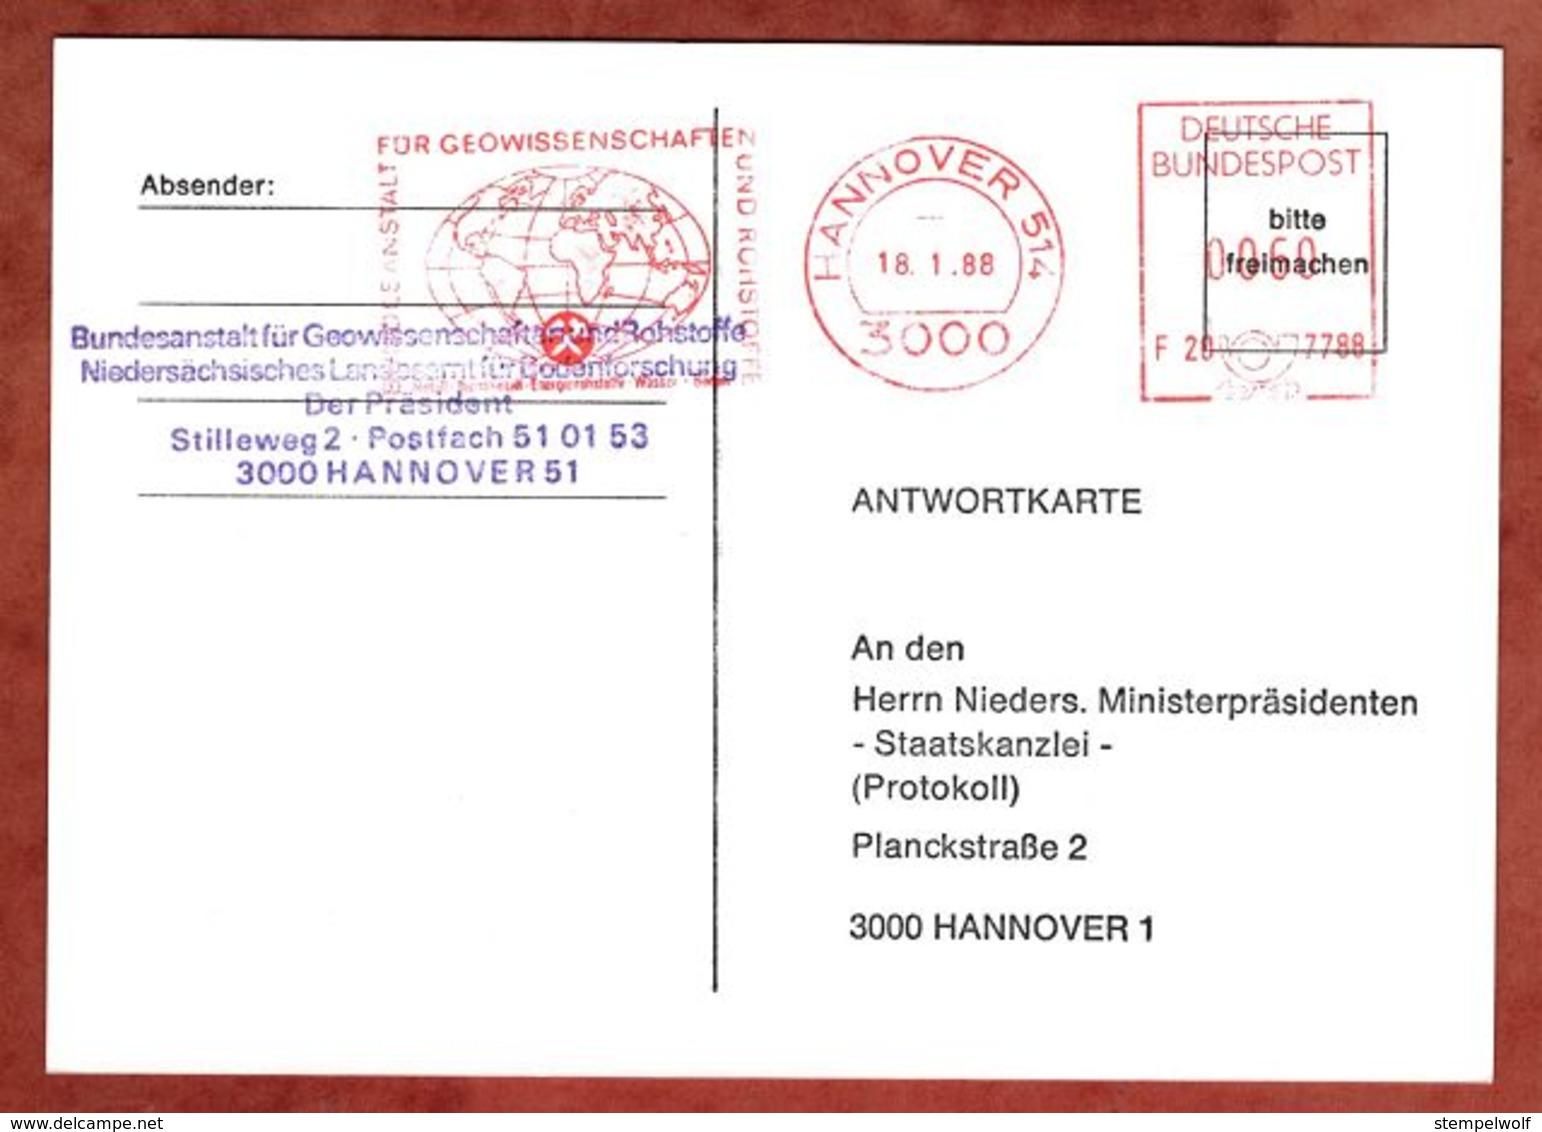 Karte, Francotyp-Postalia F20-7788, Wappen, Bundesanstalt Geowissenschaften Rohstoffe, 60 Pfg, Hannover 1988 (88537) - Covers & Documents